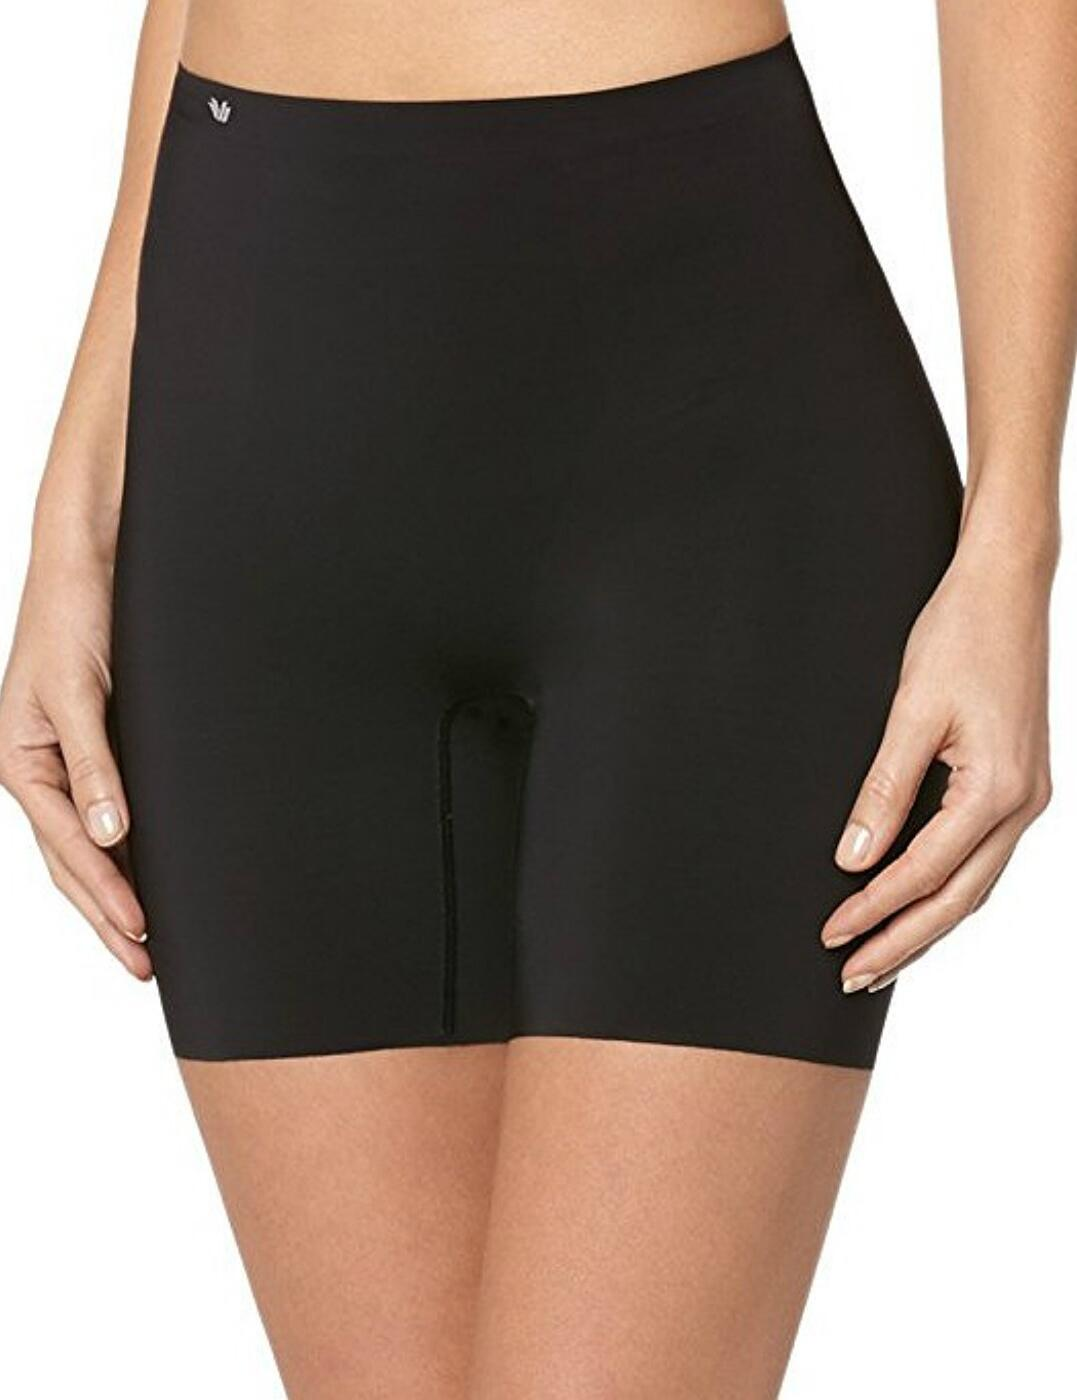 GRA541 Wacoal Beauty Secret Lift Up Panty - GRA541 Black